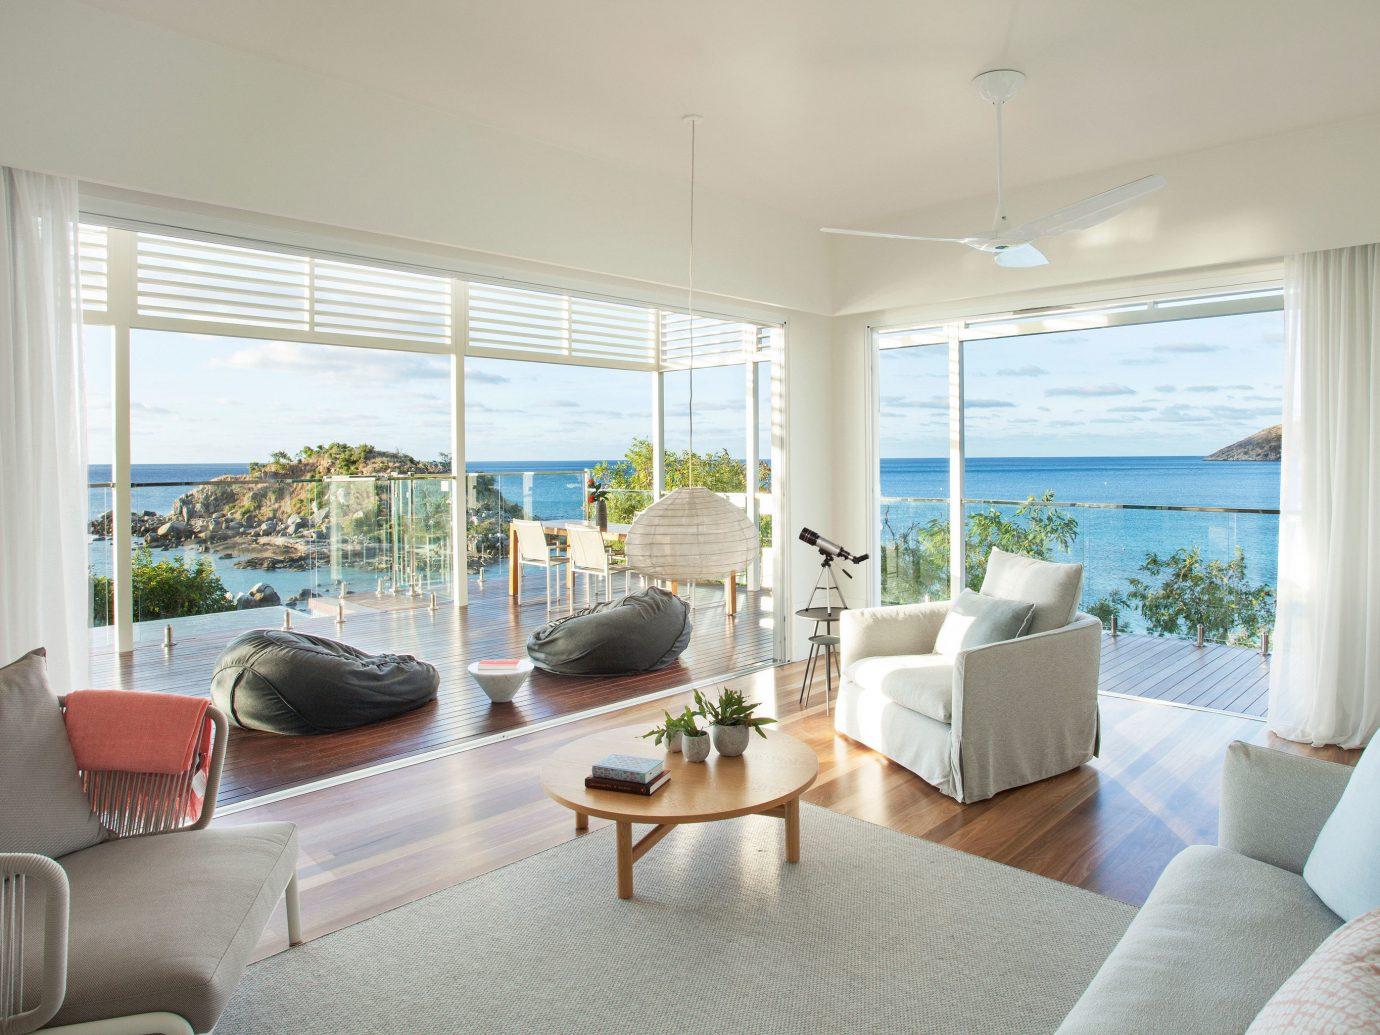 All-Inclusive Resorts Beach Hotels sofa property living room condominium home nice Villa flat